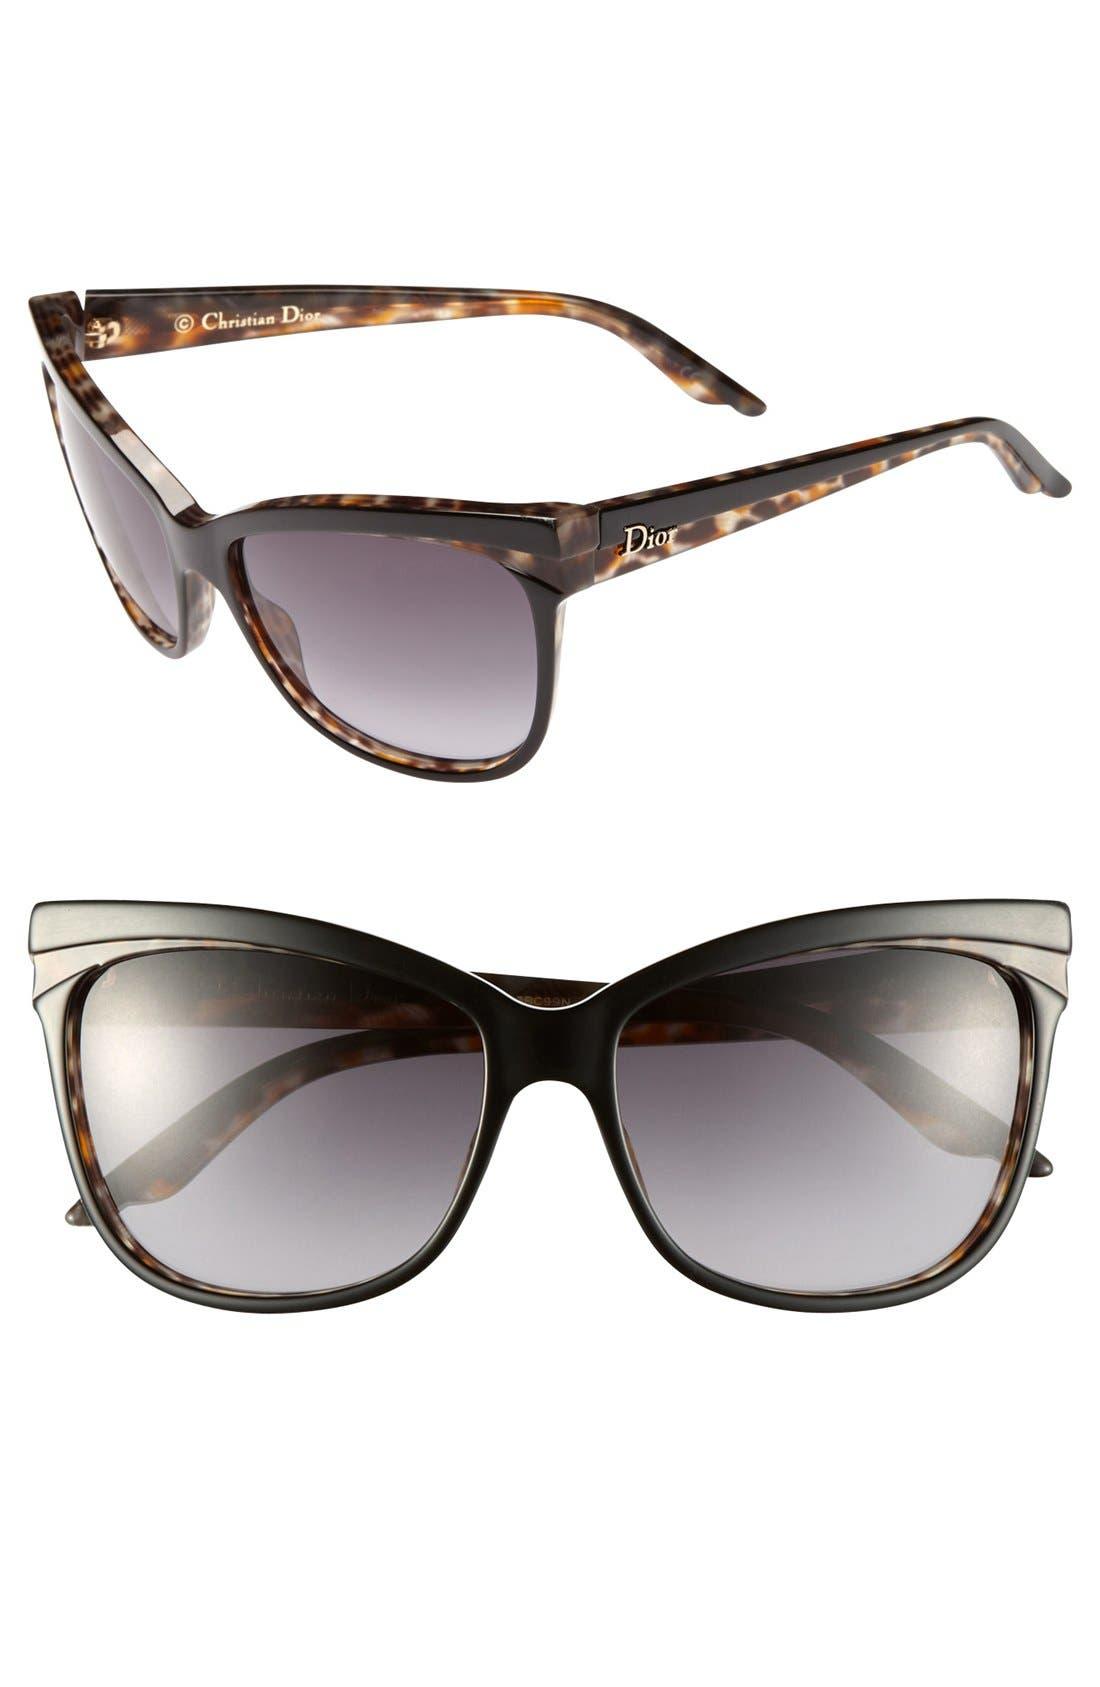 Main Image - Dior 'Sauvage 2' 58mm Retro Sunglasses